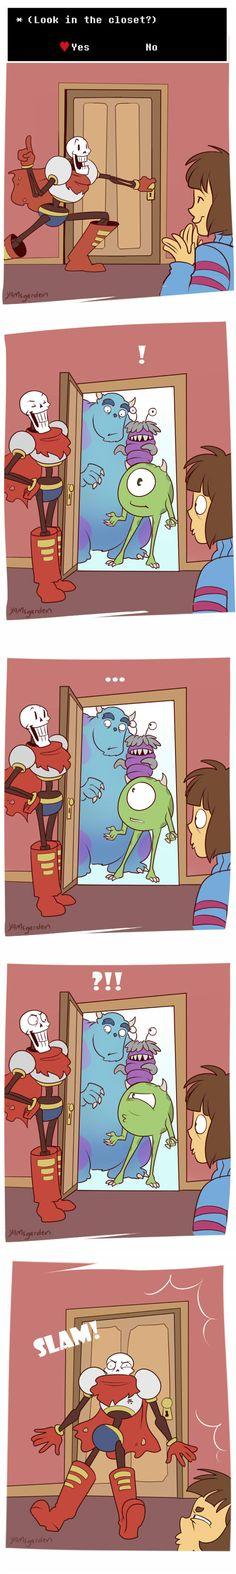 Monsters in the Closet by YAMsgarden.deviantart.com on @DeviantArt